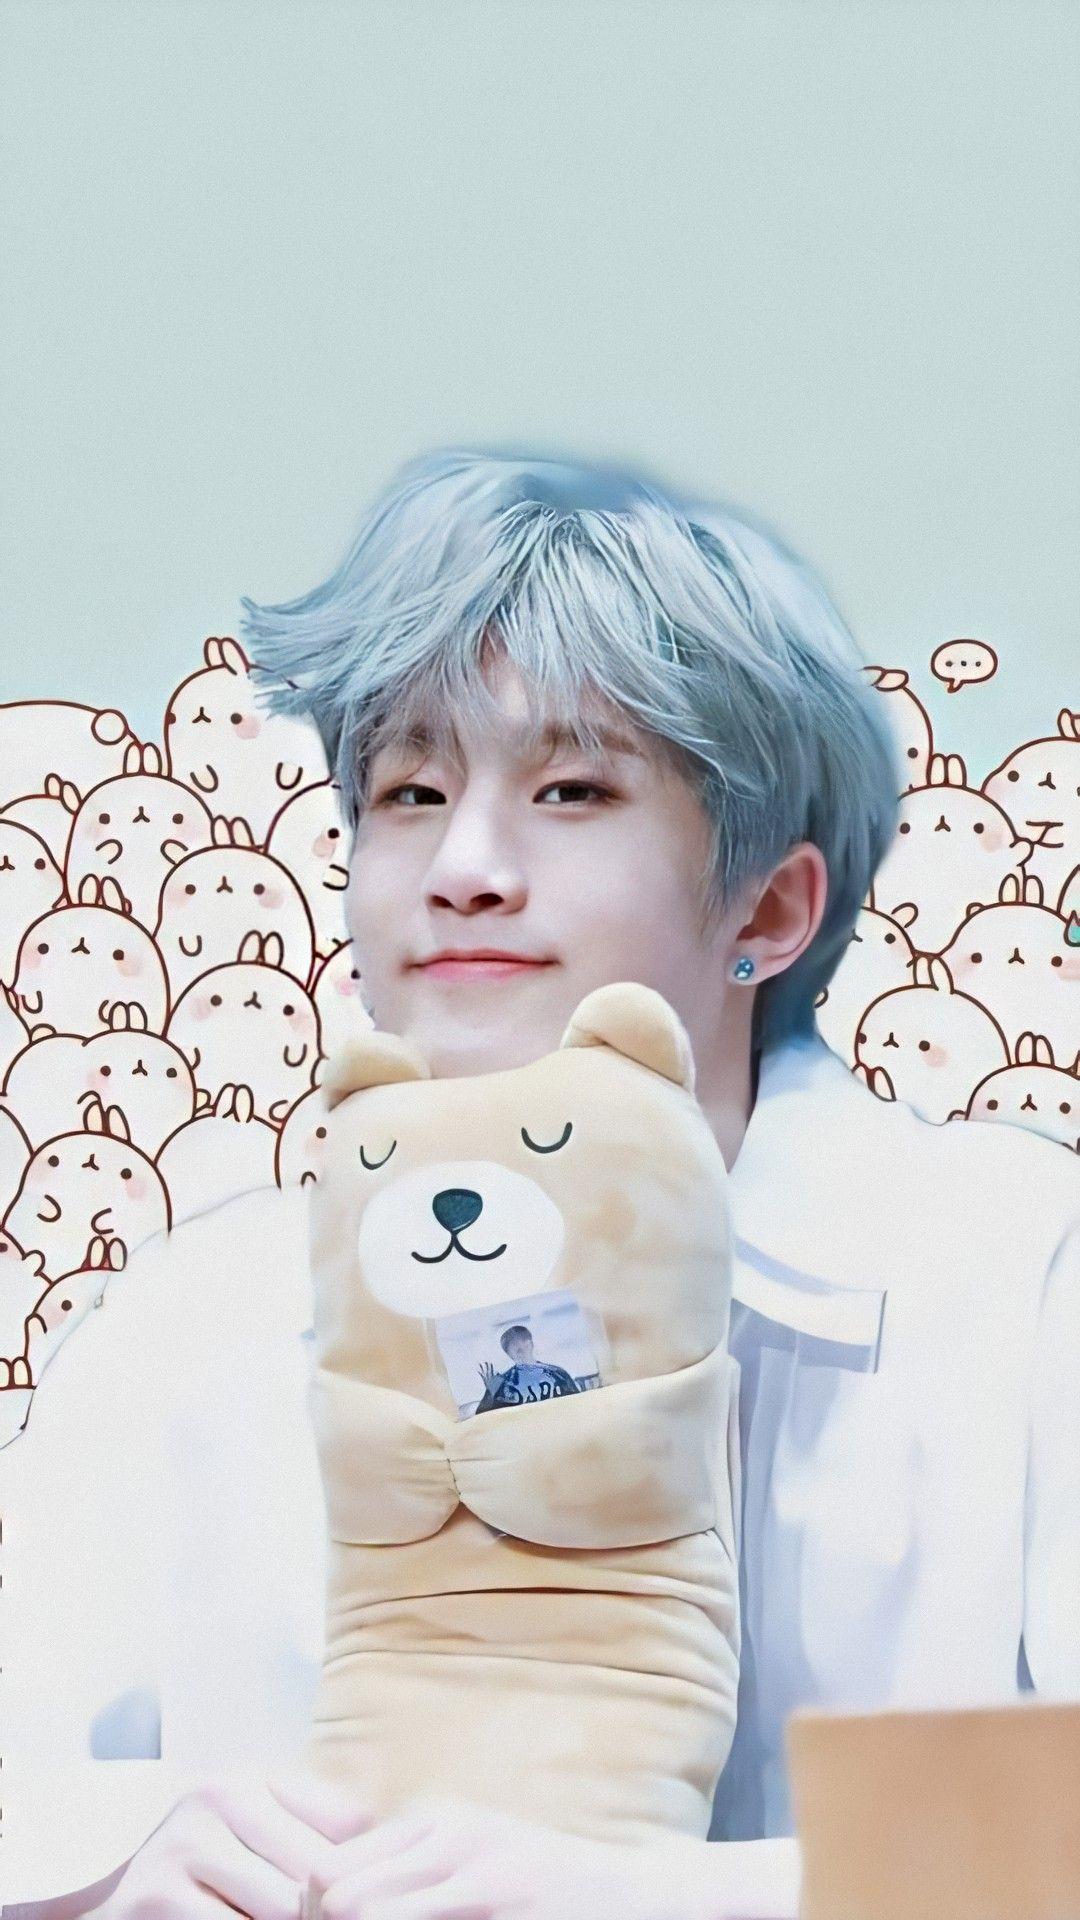 Astro Jinjin Wallpaper Cute Aktris